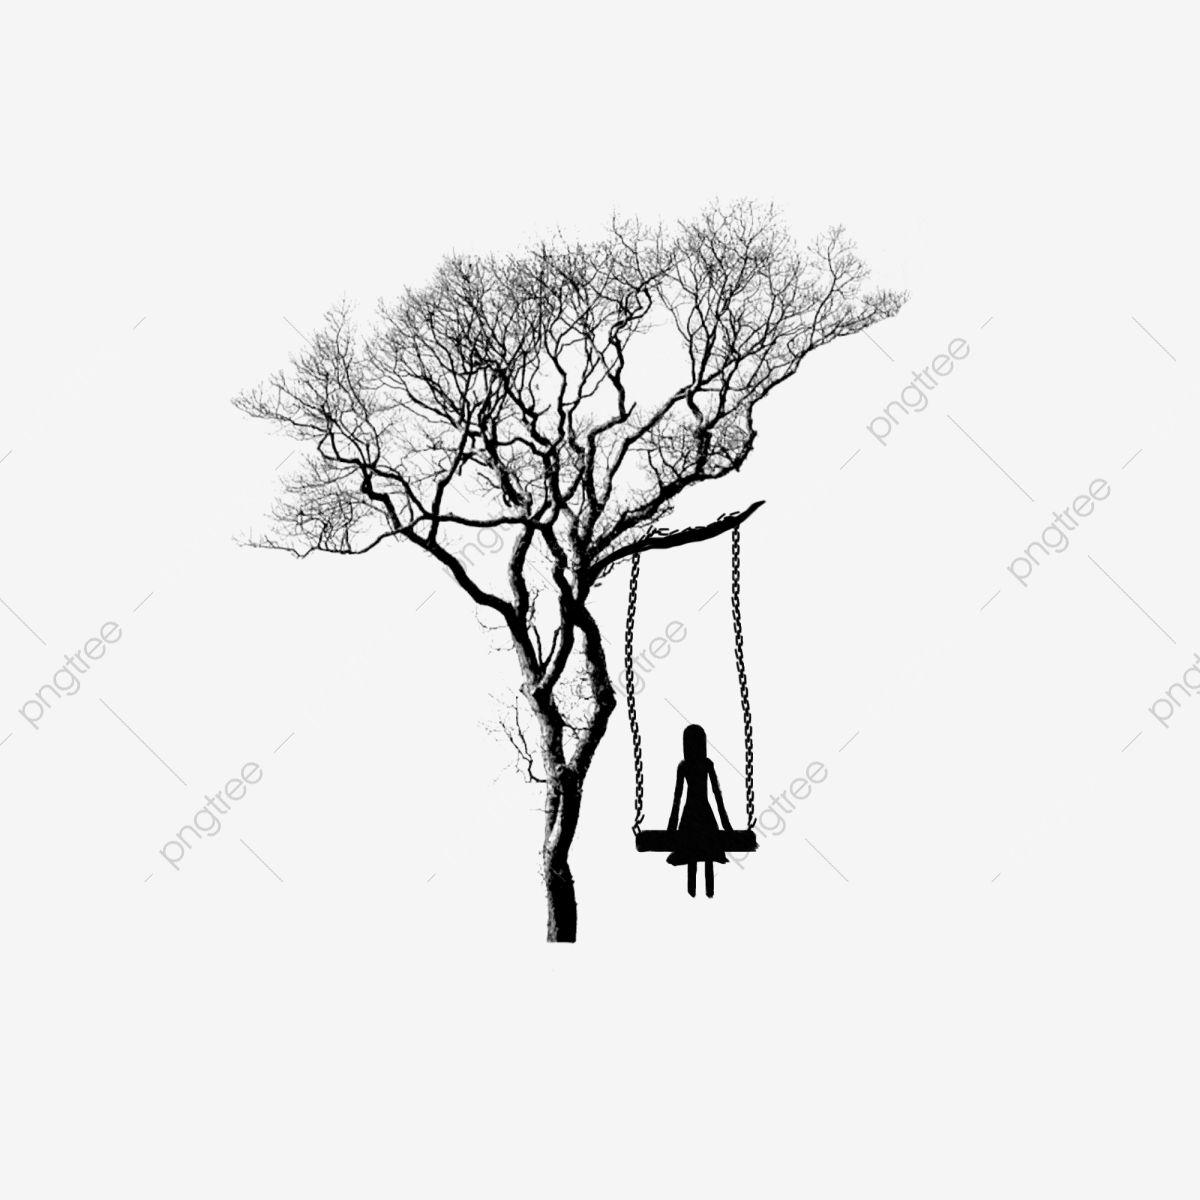 Black Tree Man Silhouette Cartoon Design Material Black Cartoon Tree Png Transparent Image And Clipart For Free Download Cartoon Design Black Tree Design